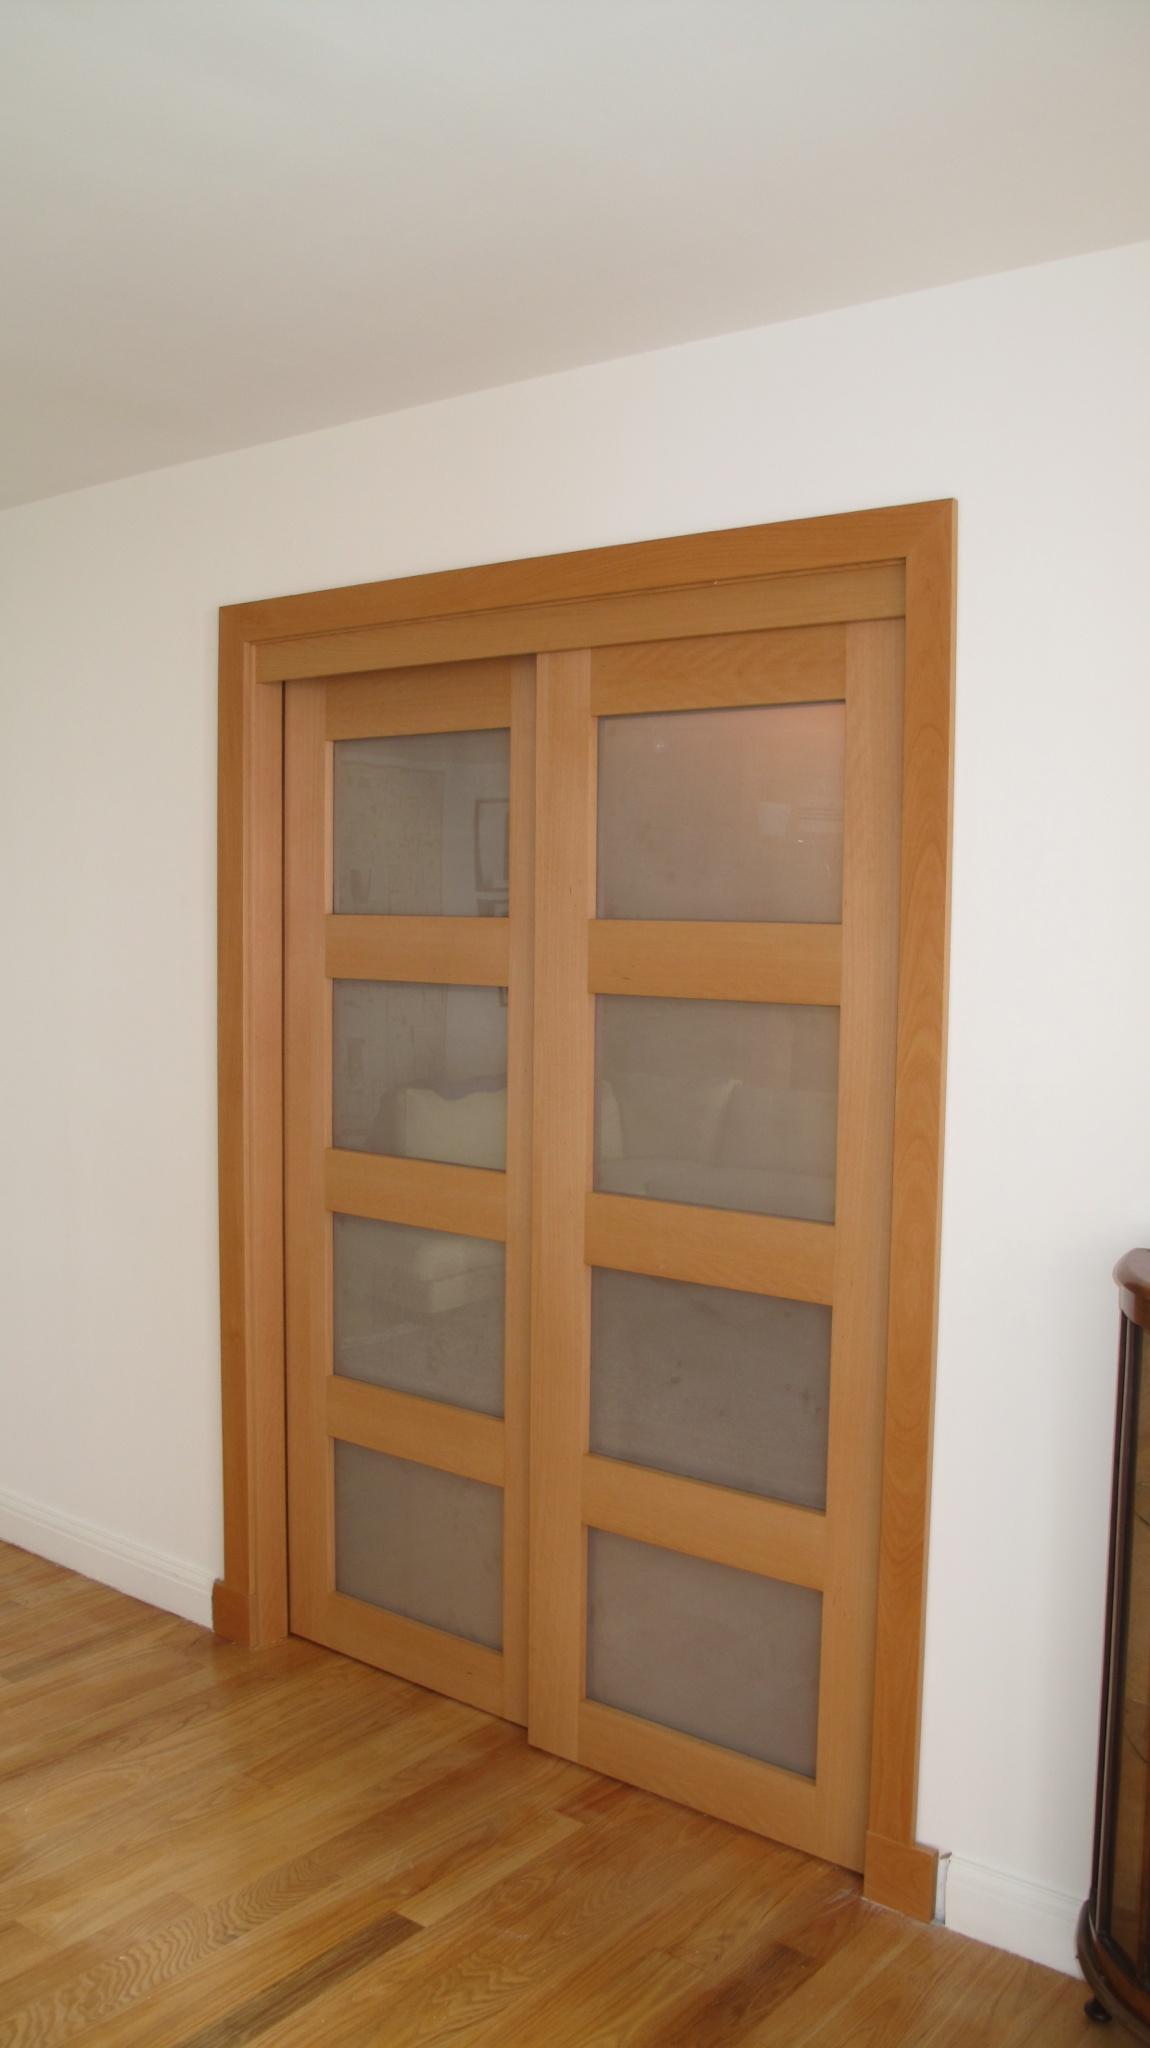 Panels-And-Doors-96.jpg